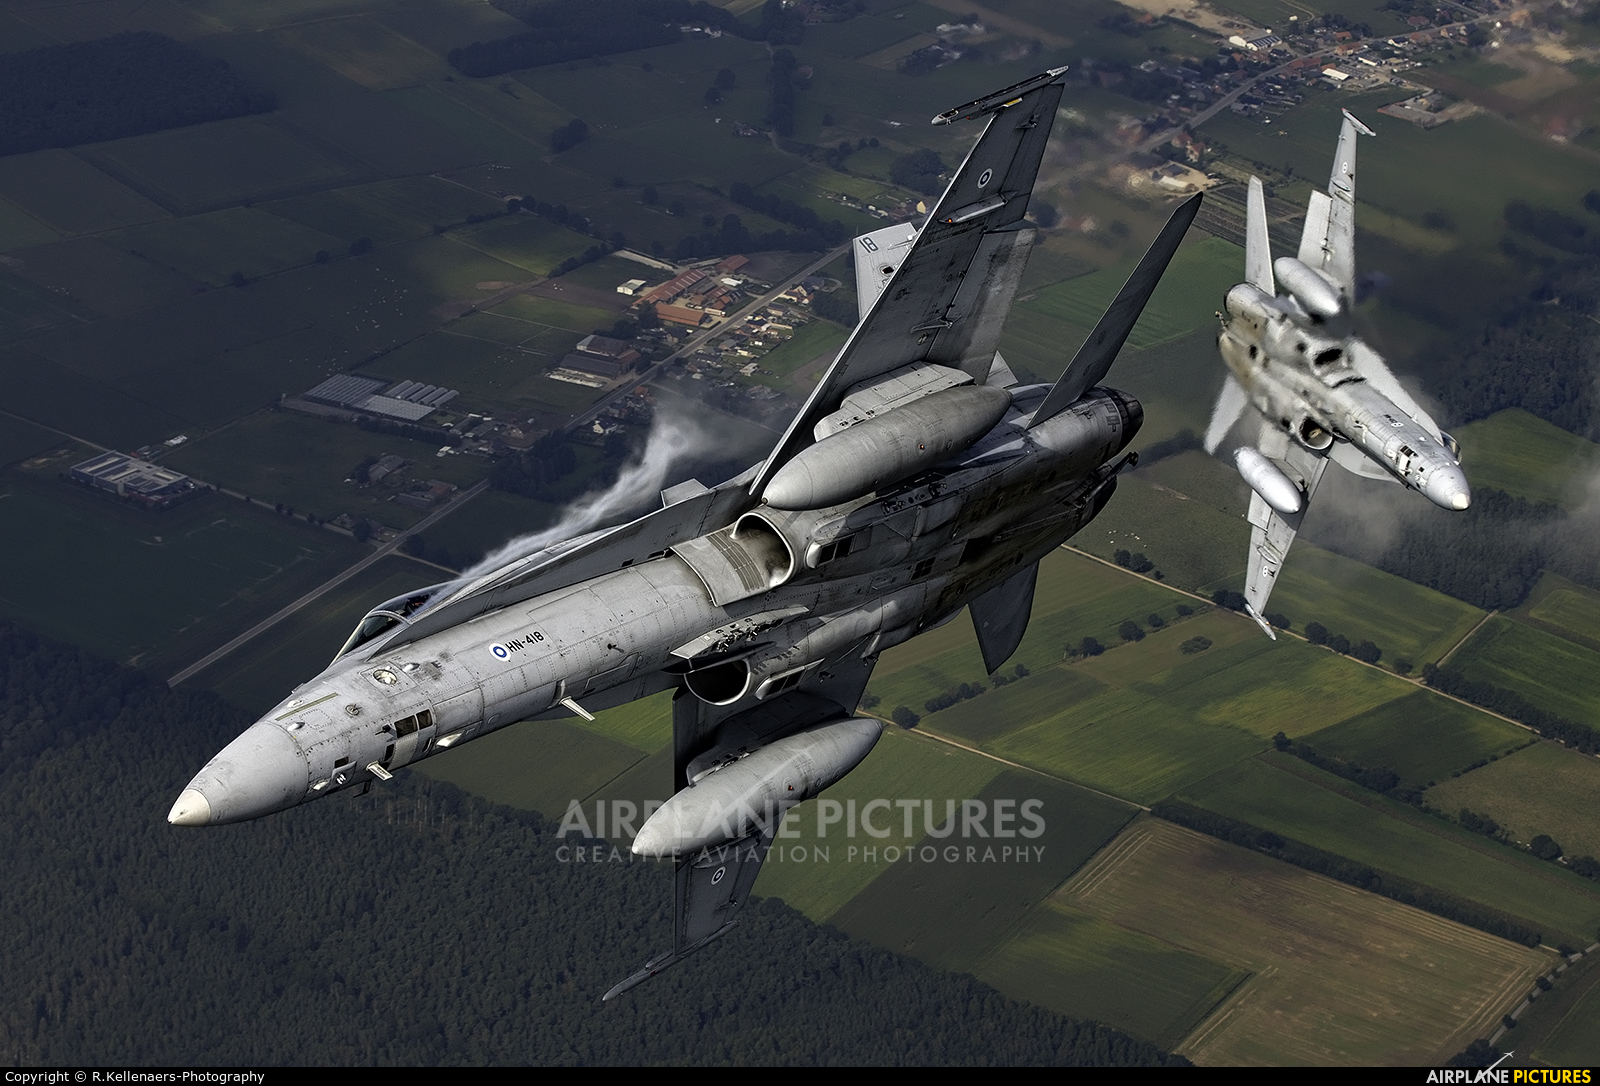 Finland - Air Force HN-418 aircraft at In Flight - Belgium